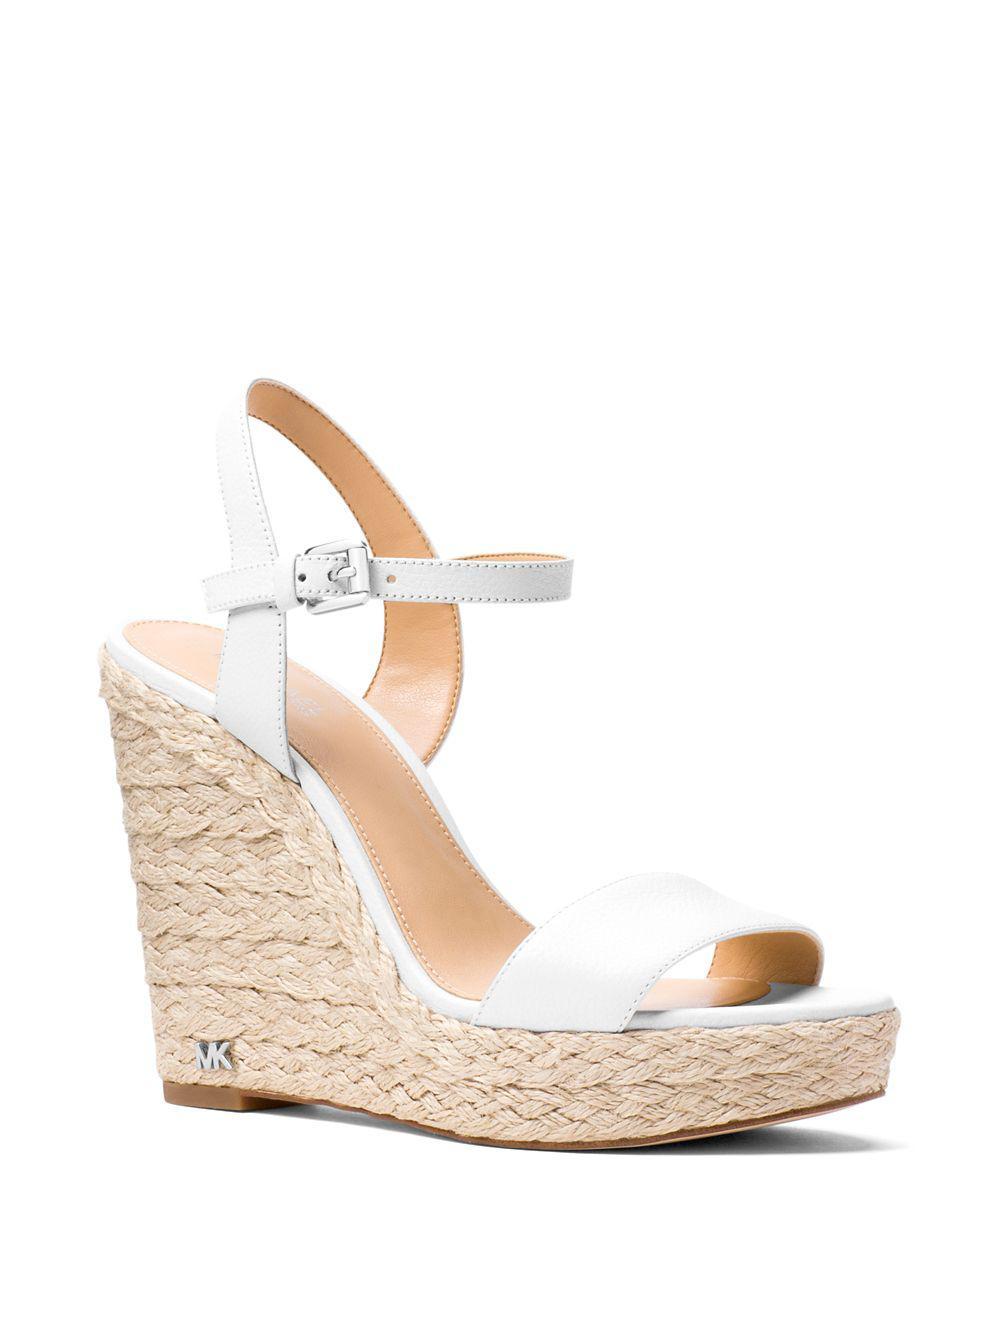 106f76acf6d MICHAEL Michael Kors White Jill Leather Wedge Sandals